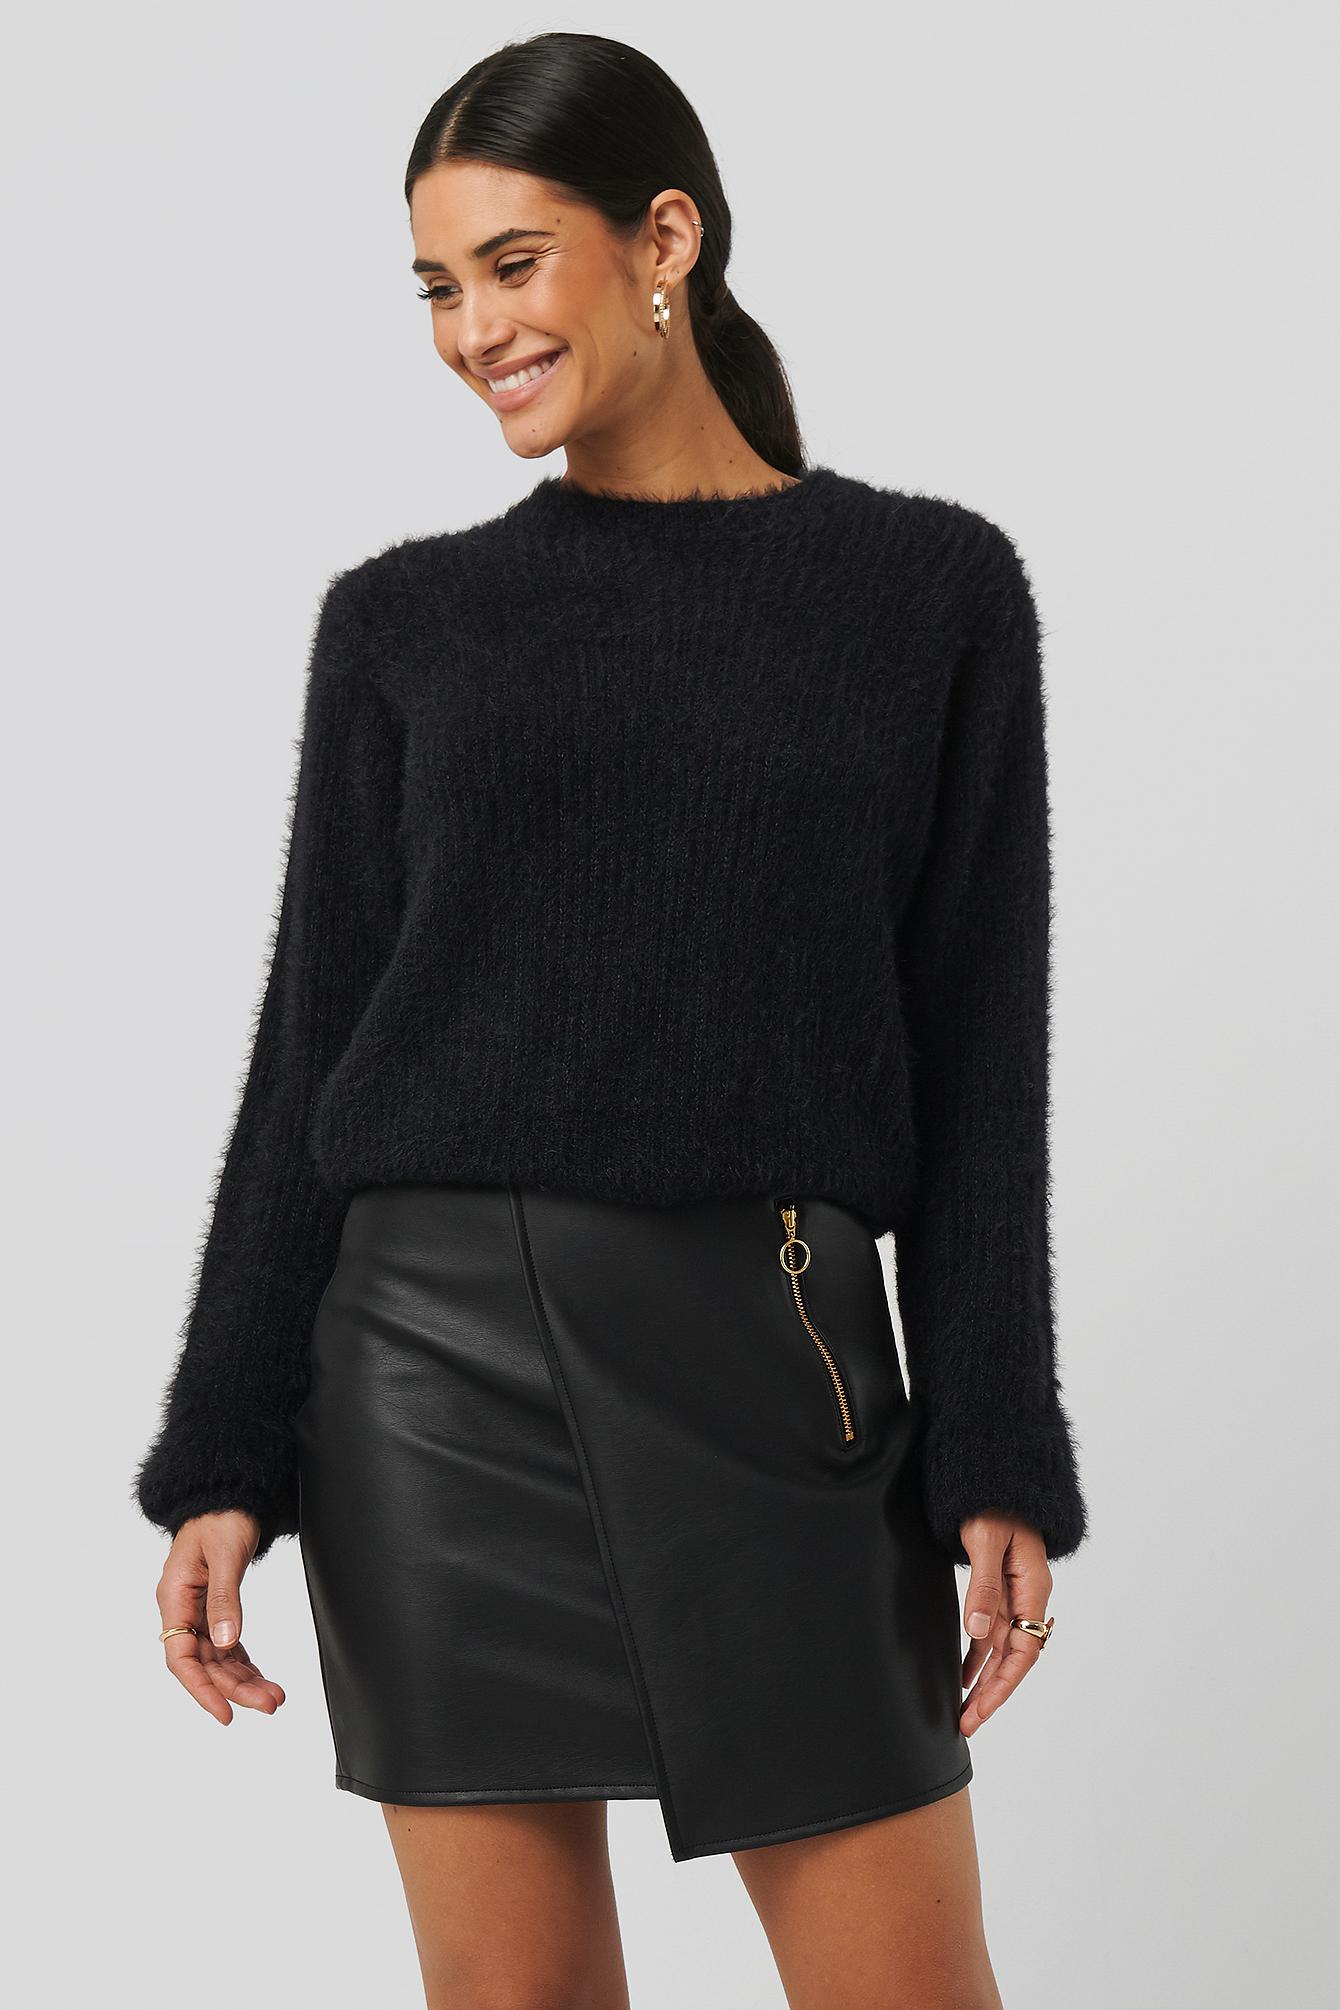 sara sieppi x na-kd -  Asymmetric PU Zipper Skirt - Black